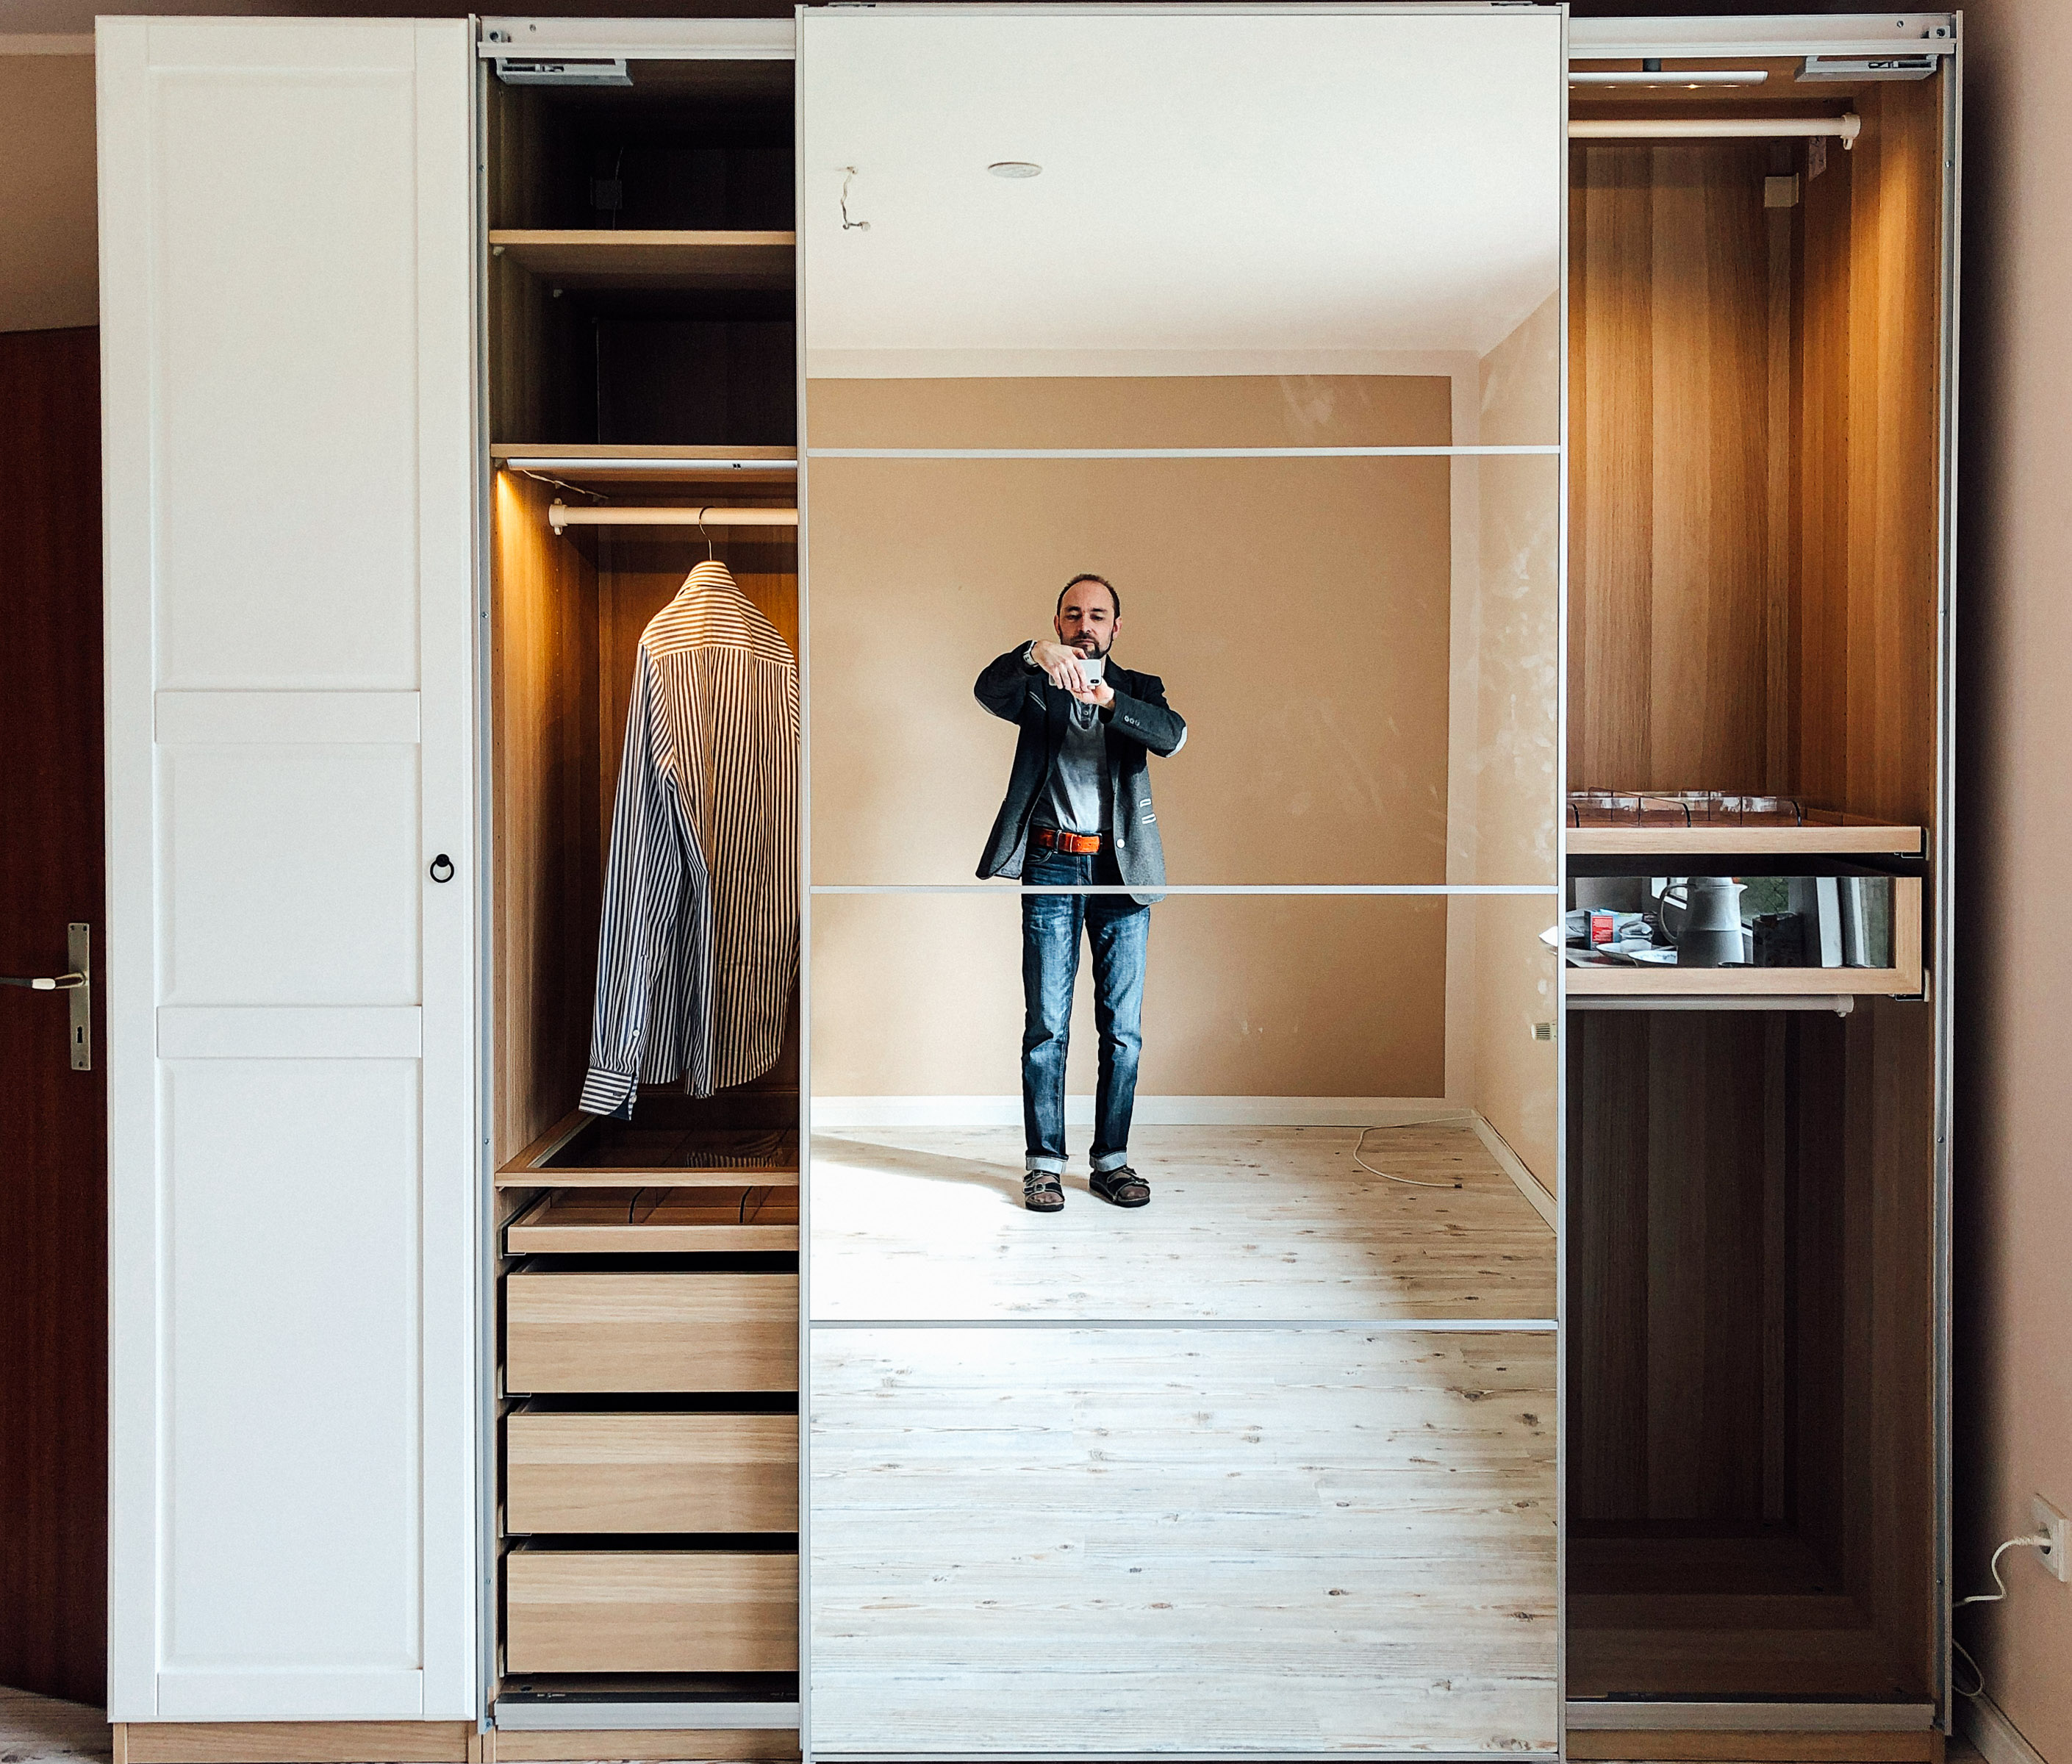 Ikea Pax Beratung Lieferung Aufbau Voller Erfolg Nsonic